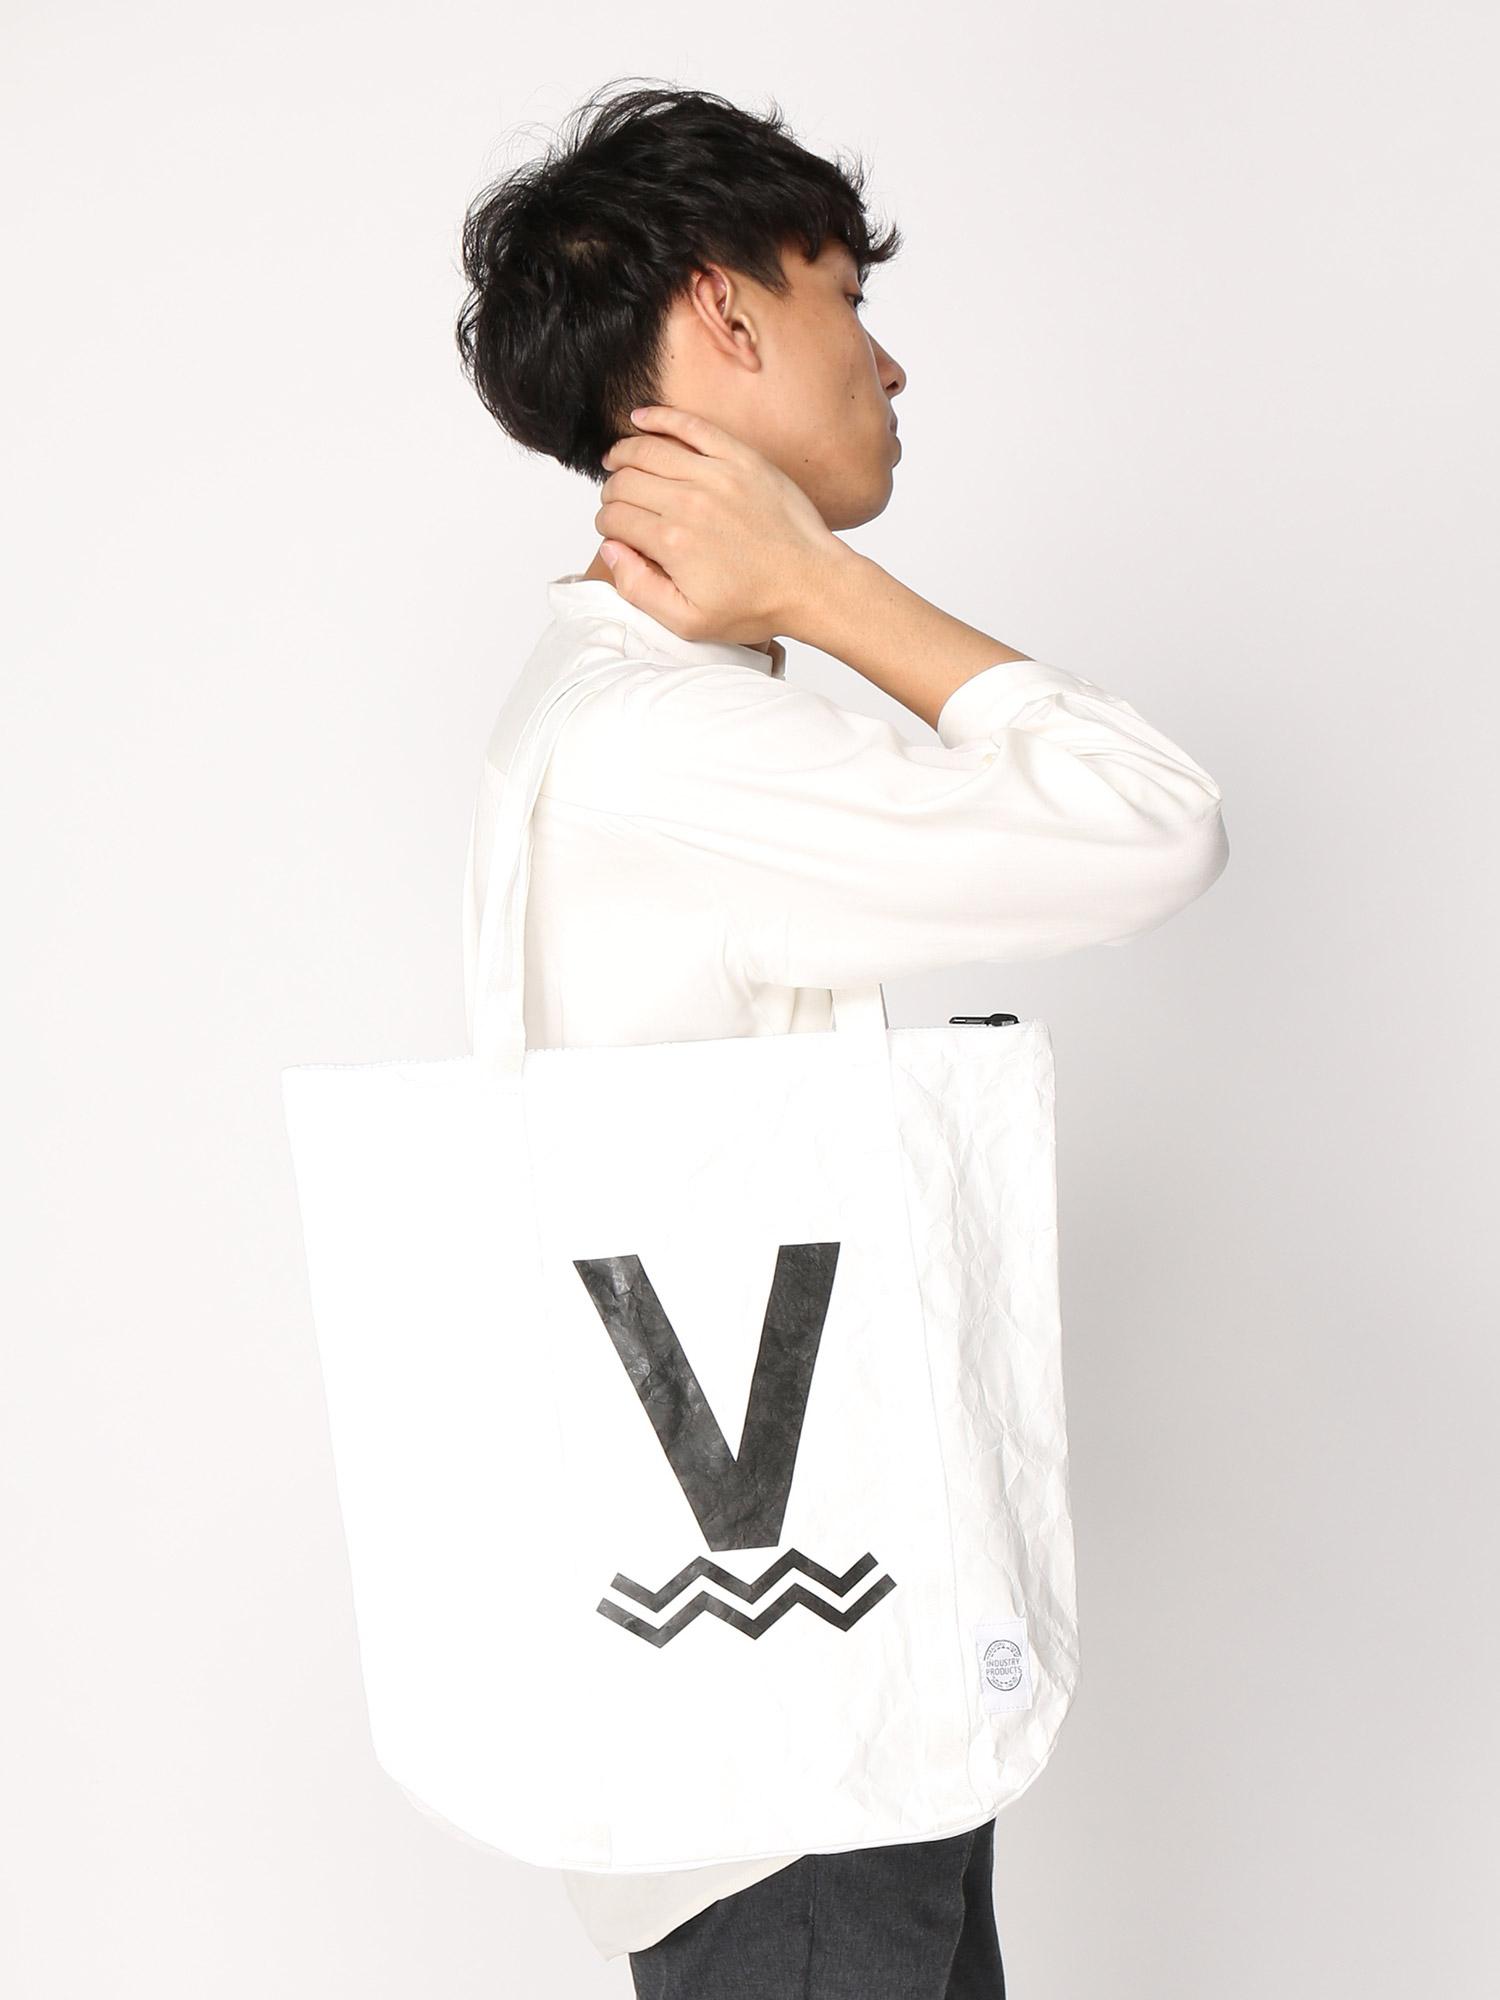 WEGO/タイベックトートバッグ